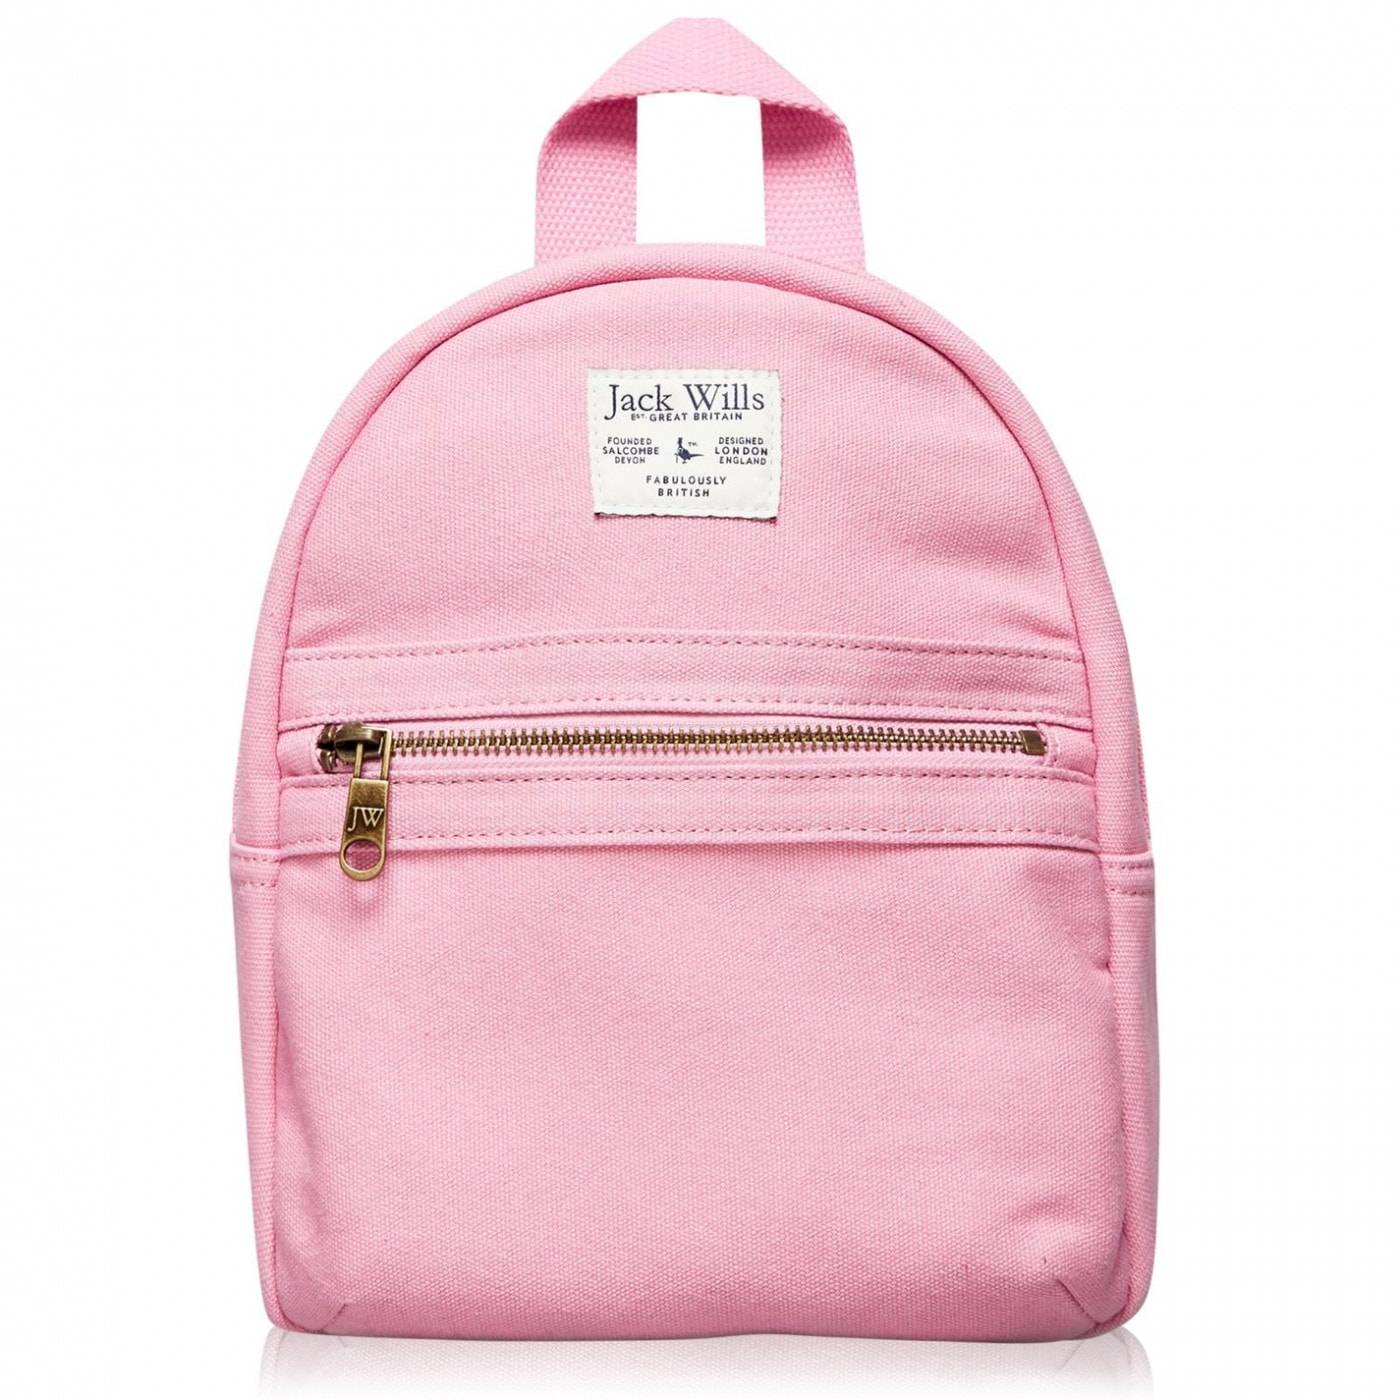 Jack Wills Elstree Backpack